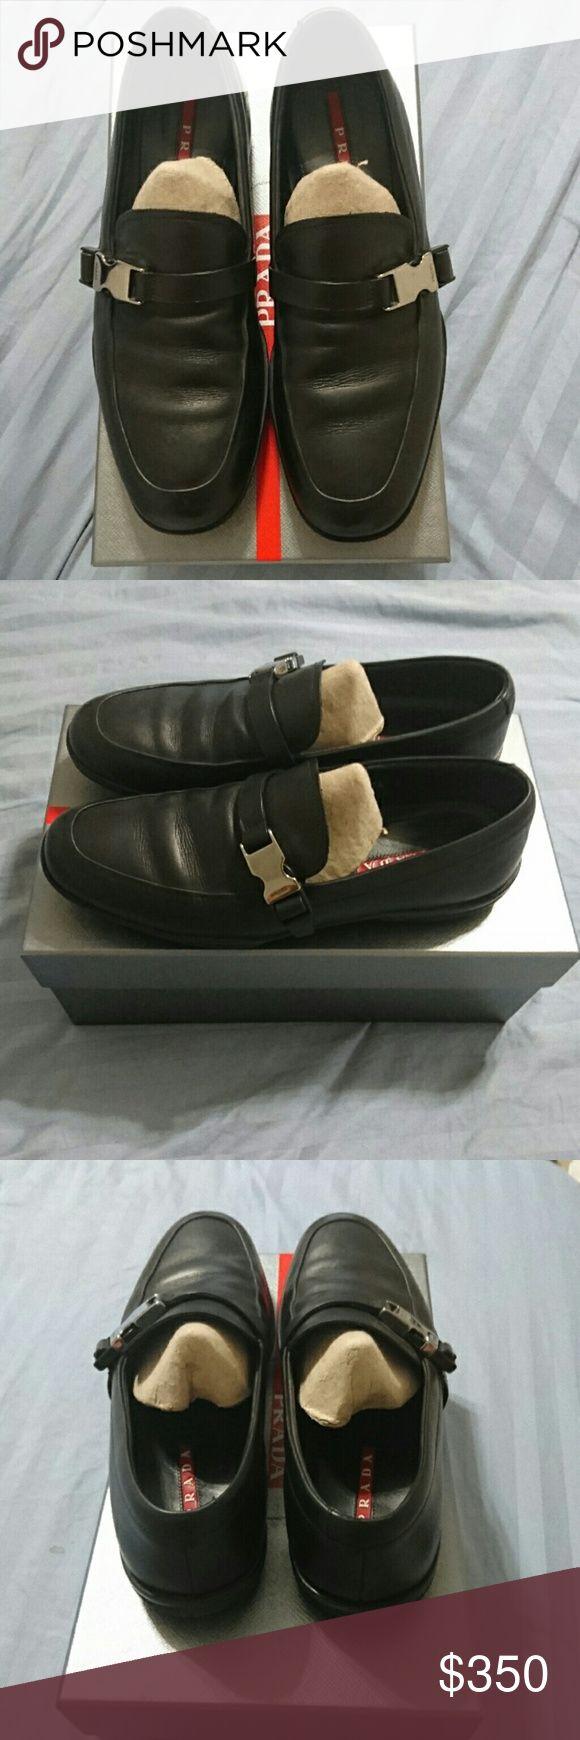 Prada mens shoes size 7 Prada slip on buckle shoes Prada Shoes Loafers & Slip-Ons